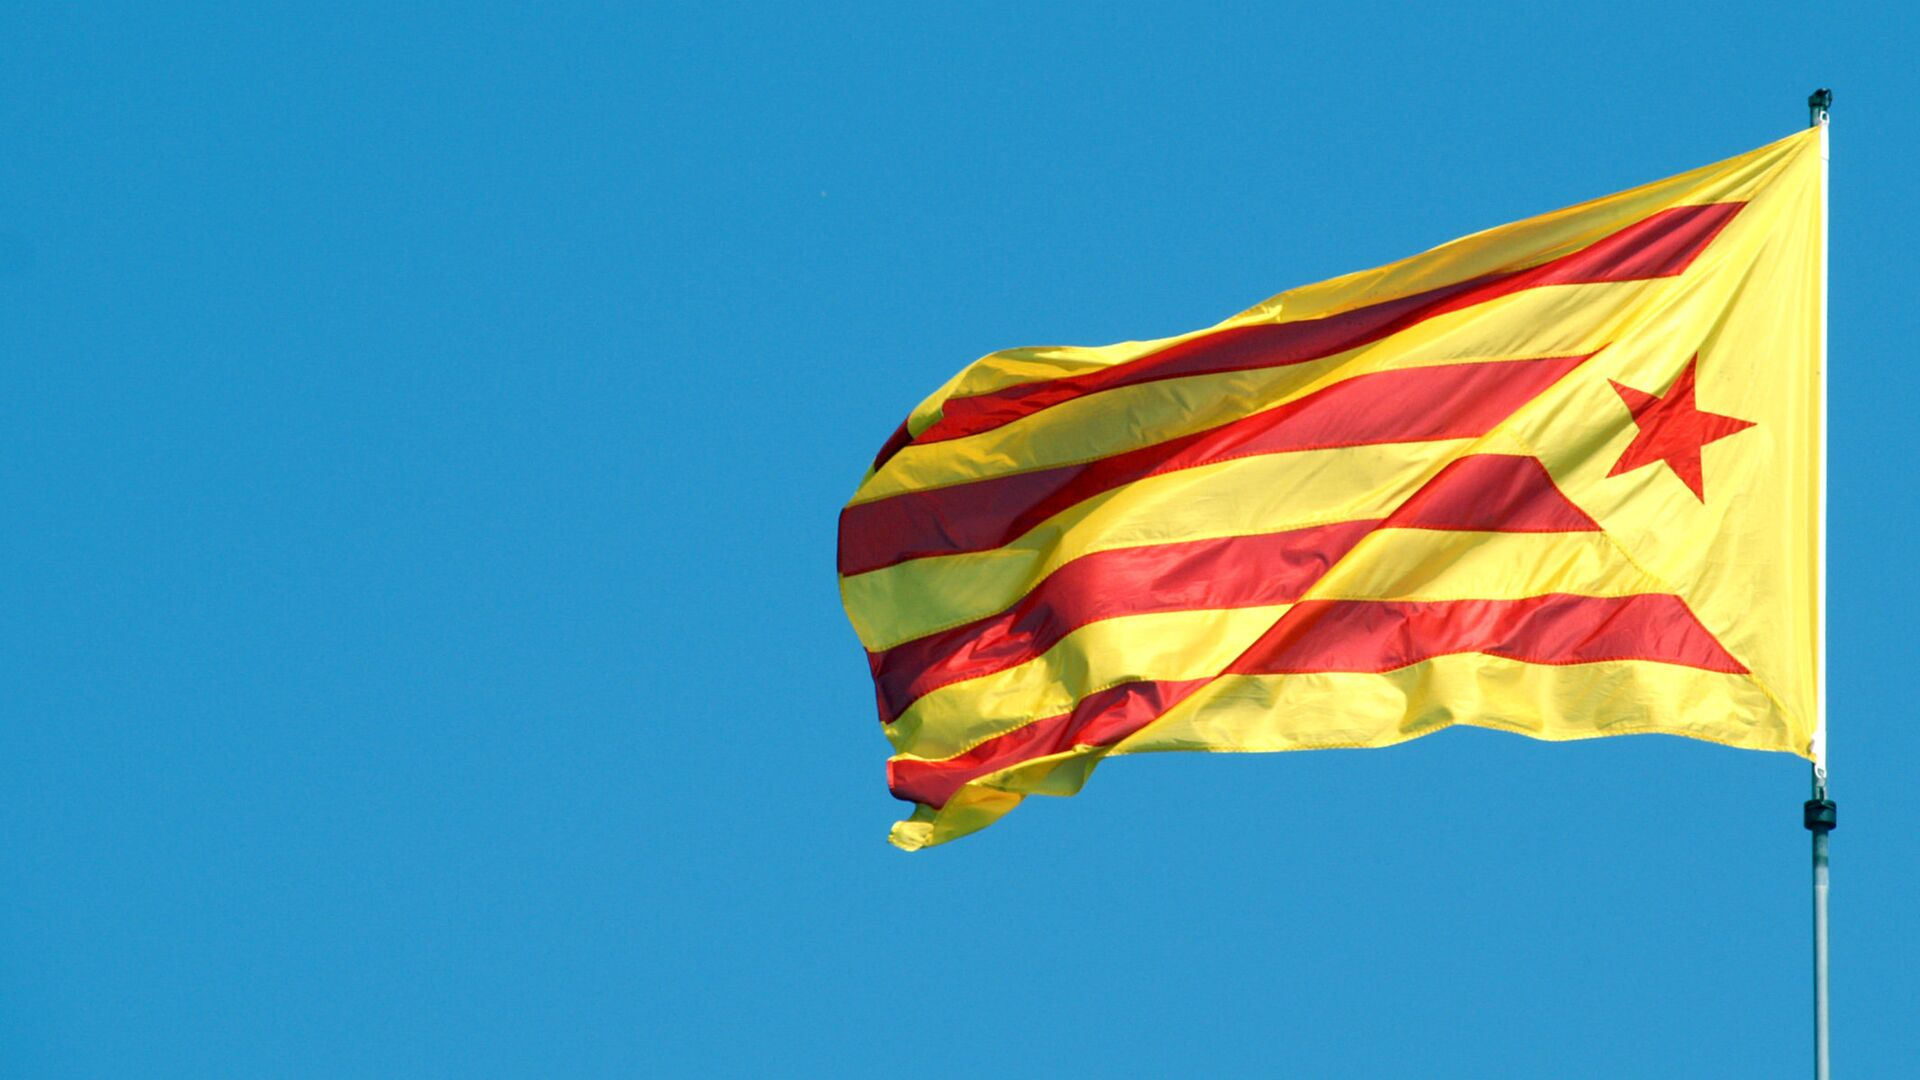 Bandera independentista catalana (archivo) - Sputnik Mundo, 1920, 14.02.2021